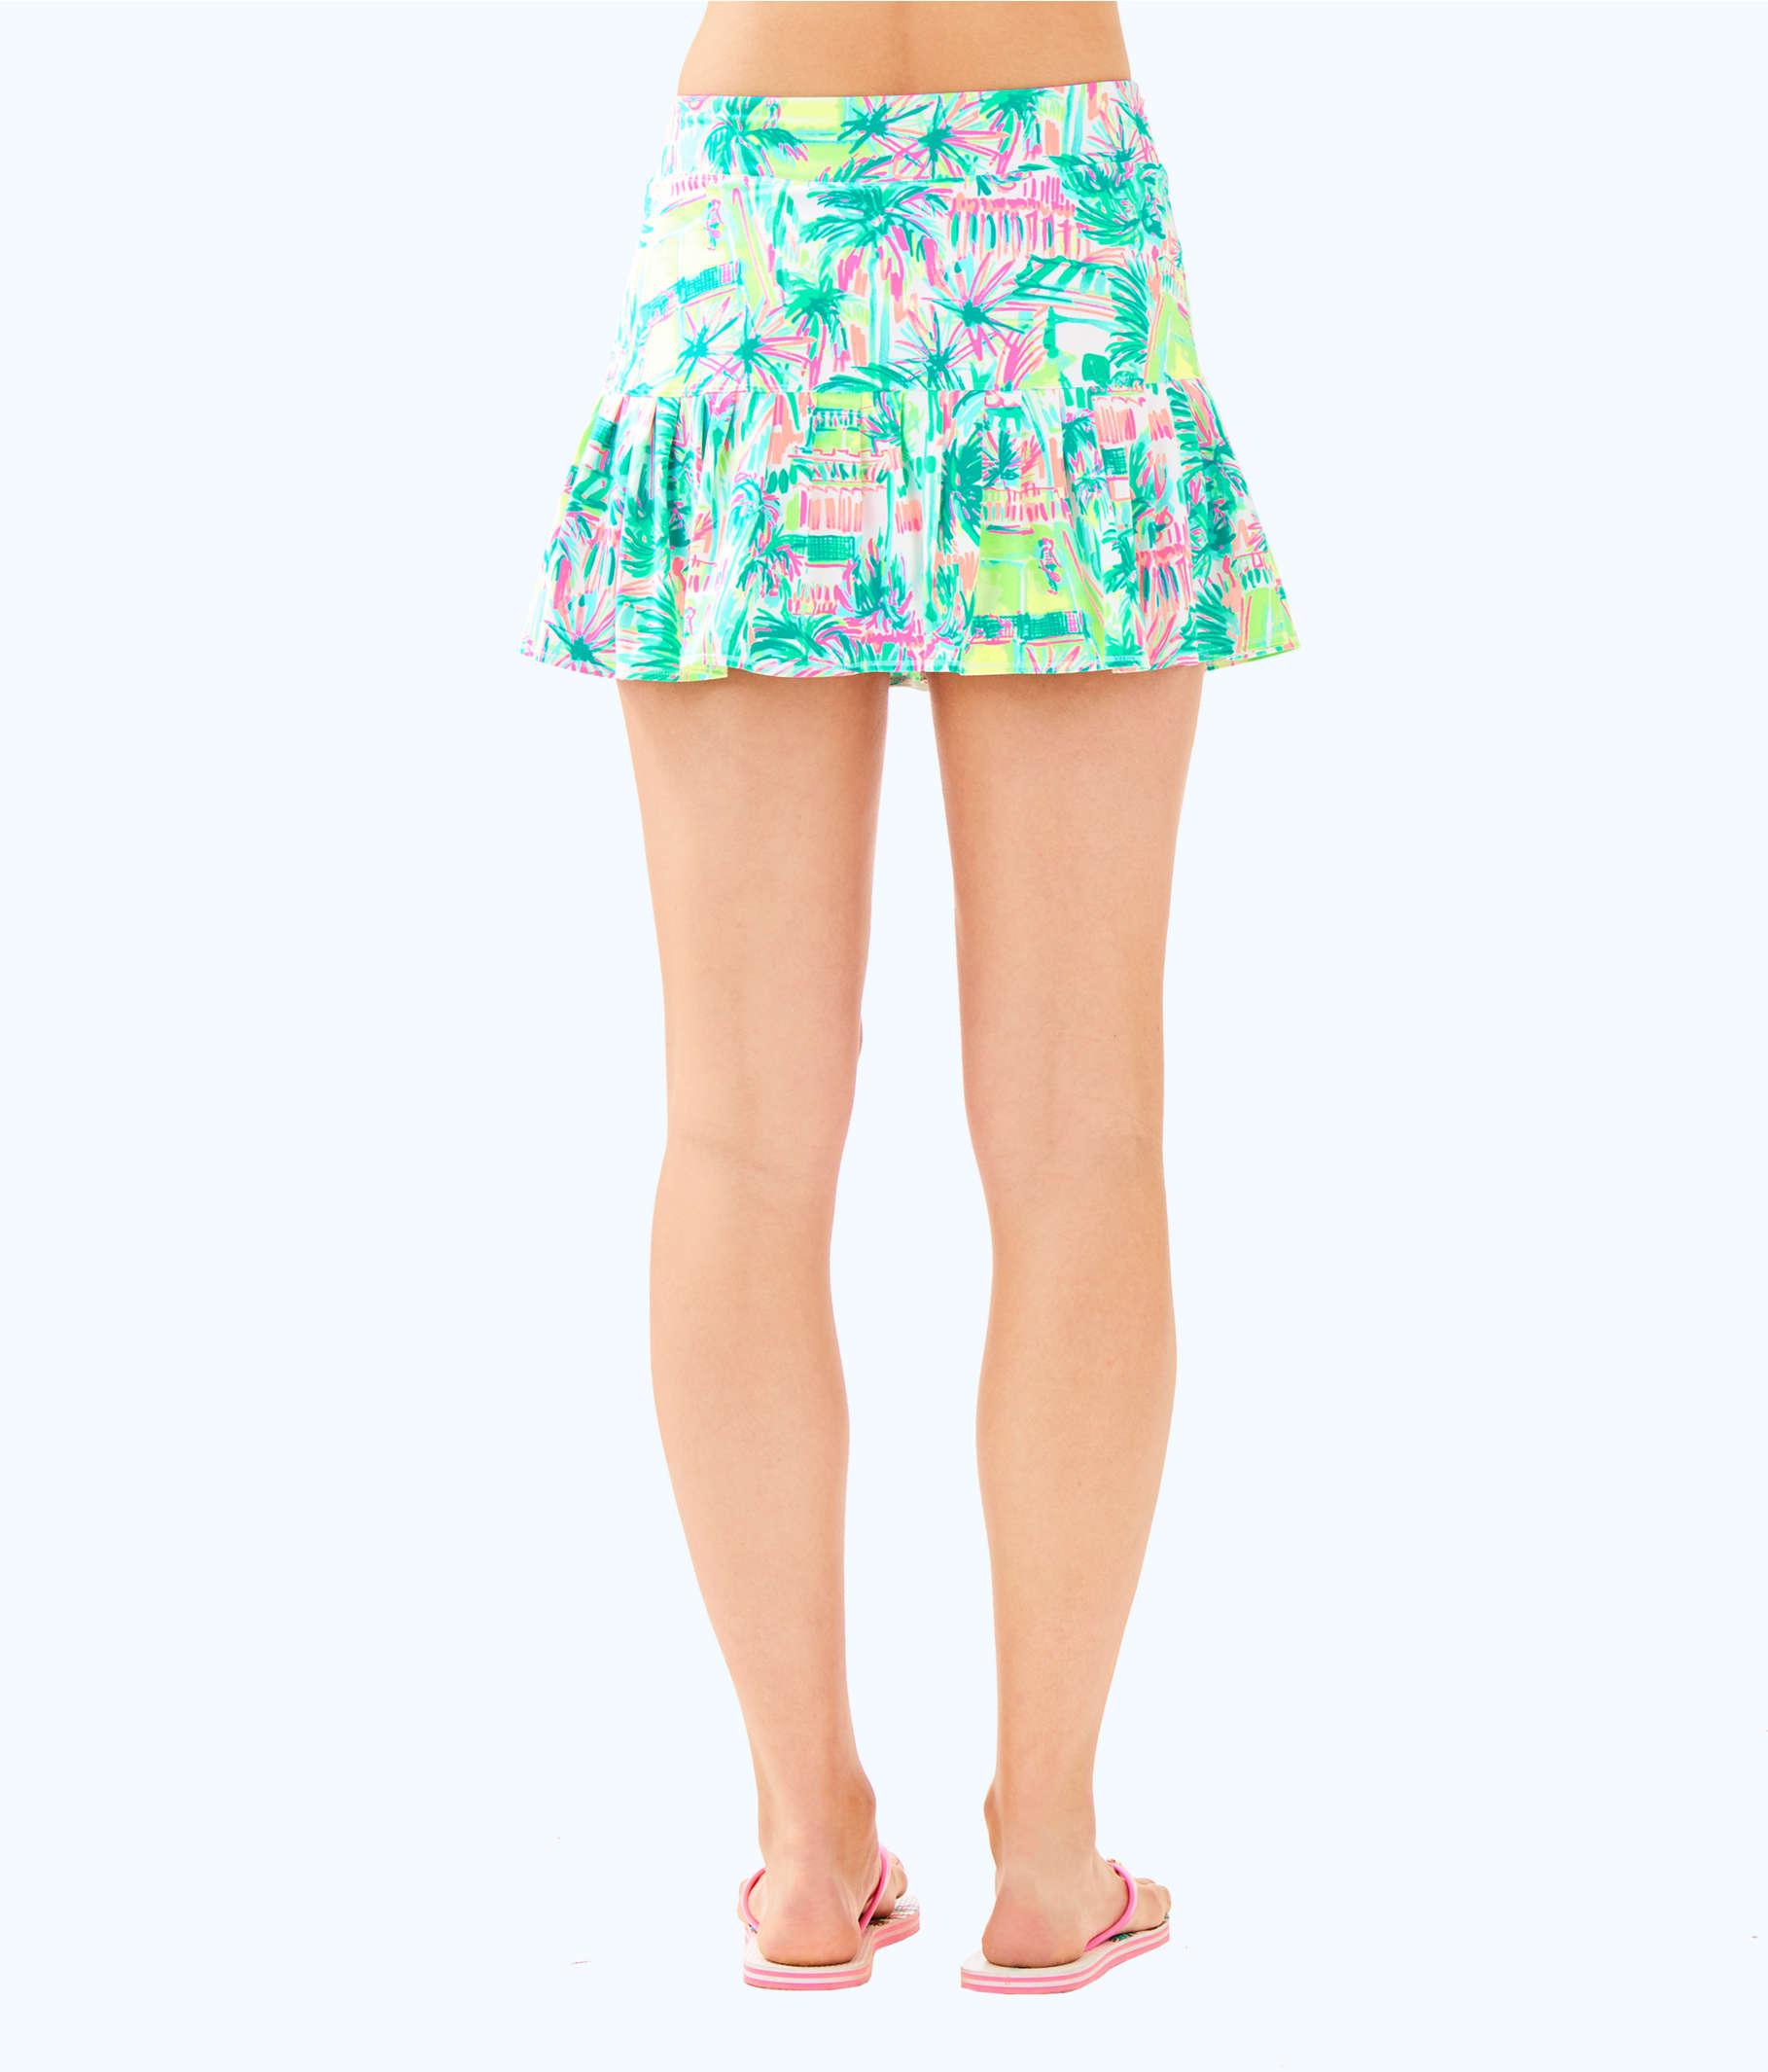 Women's Clothing Women's Lilly Pulitzer Skort Size 8